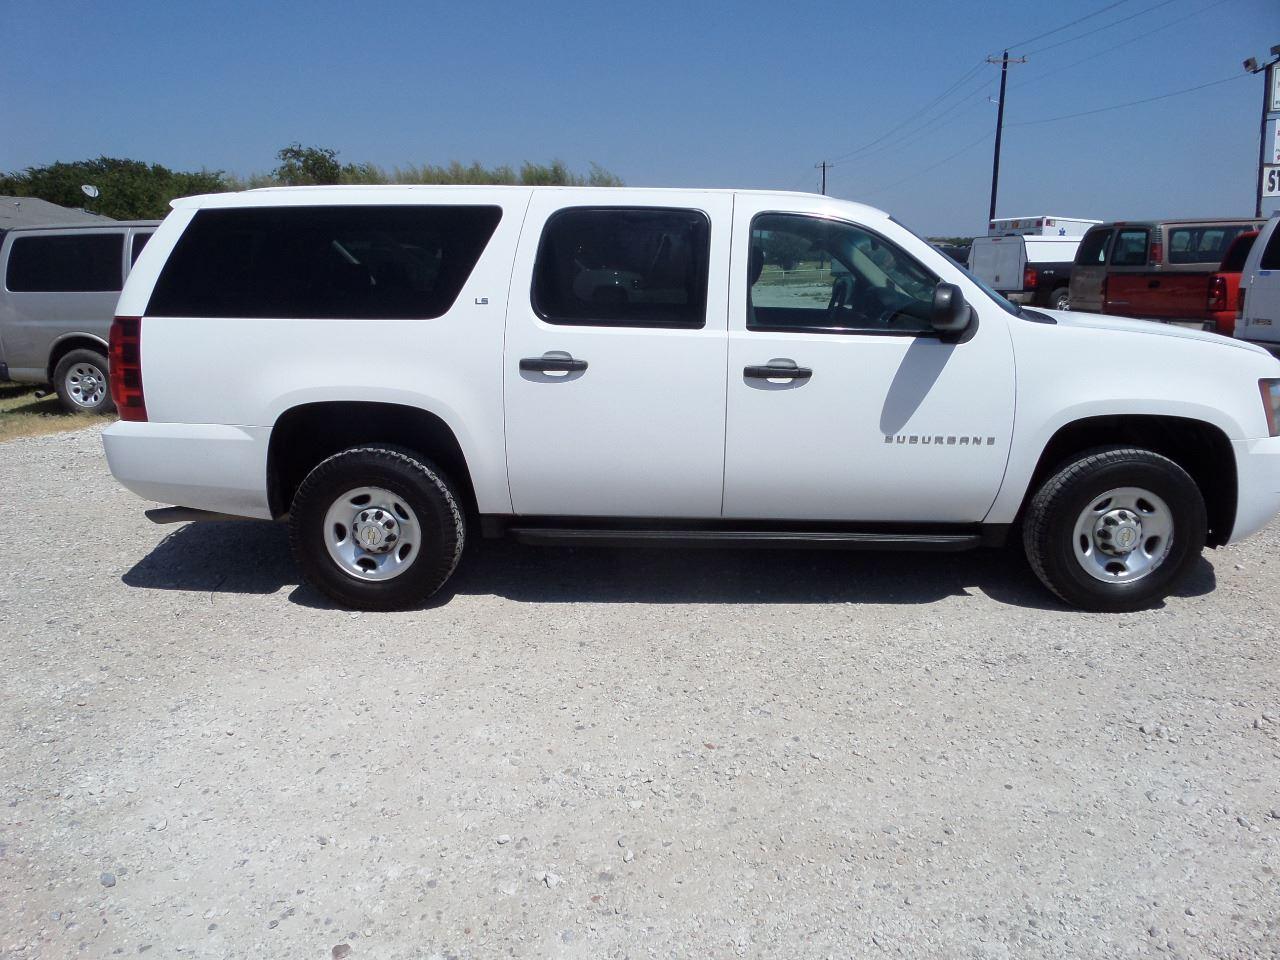 2009 Chevrolet Suburban for sale at AUTO FLEET REMARKETING, INC. in Van Alstyne TX